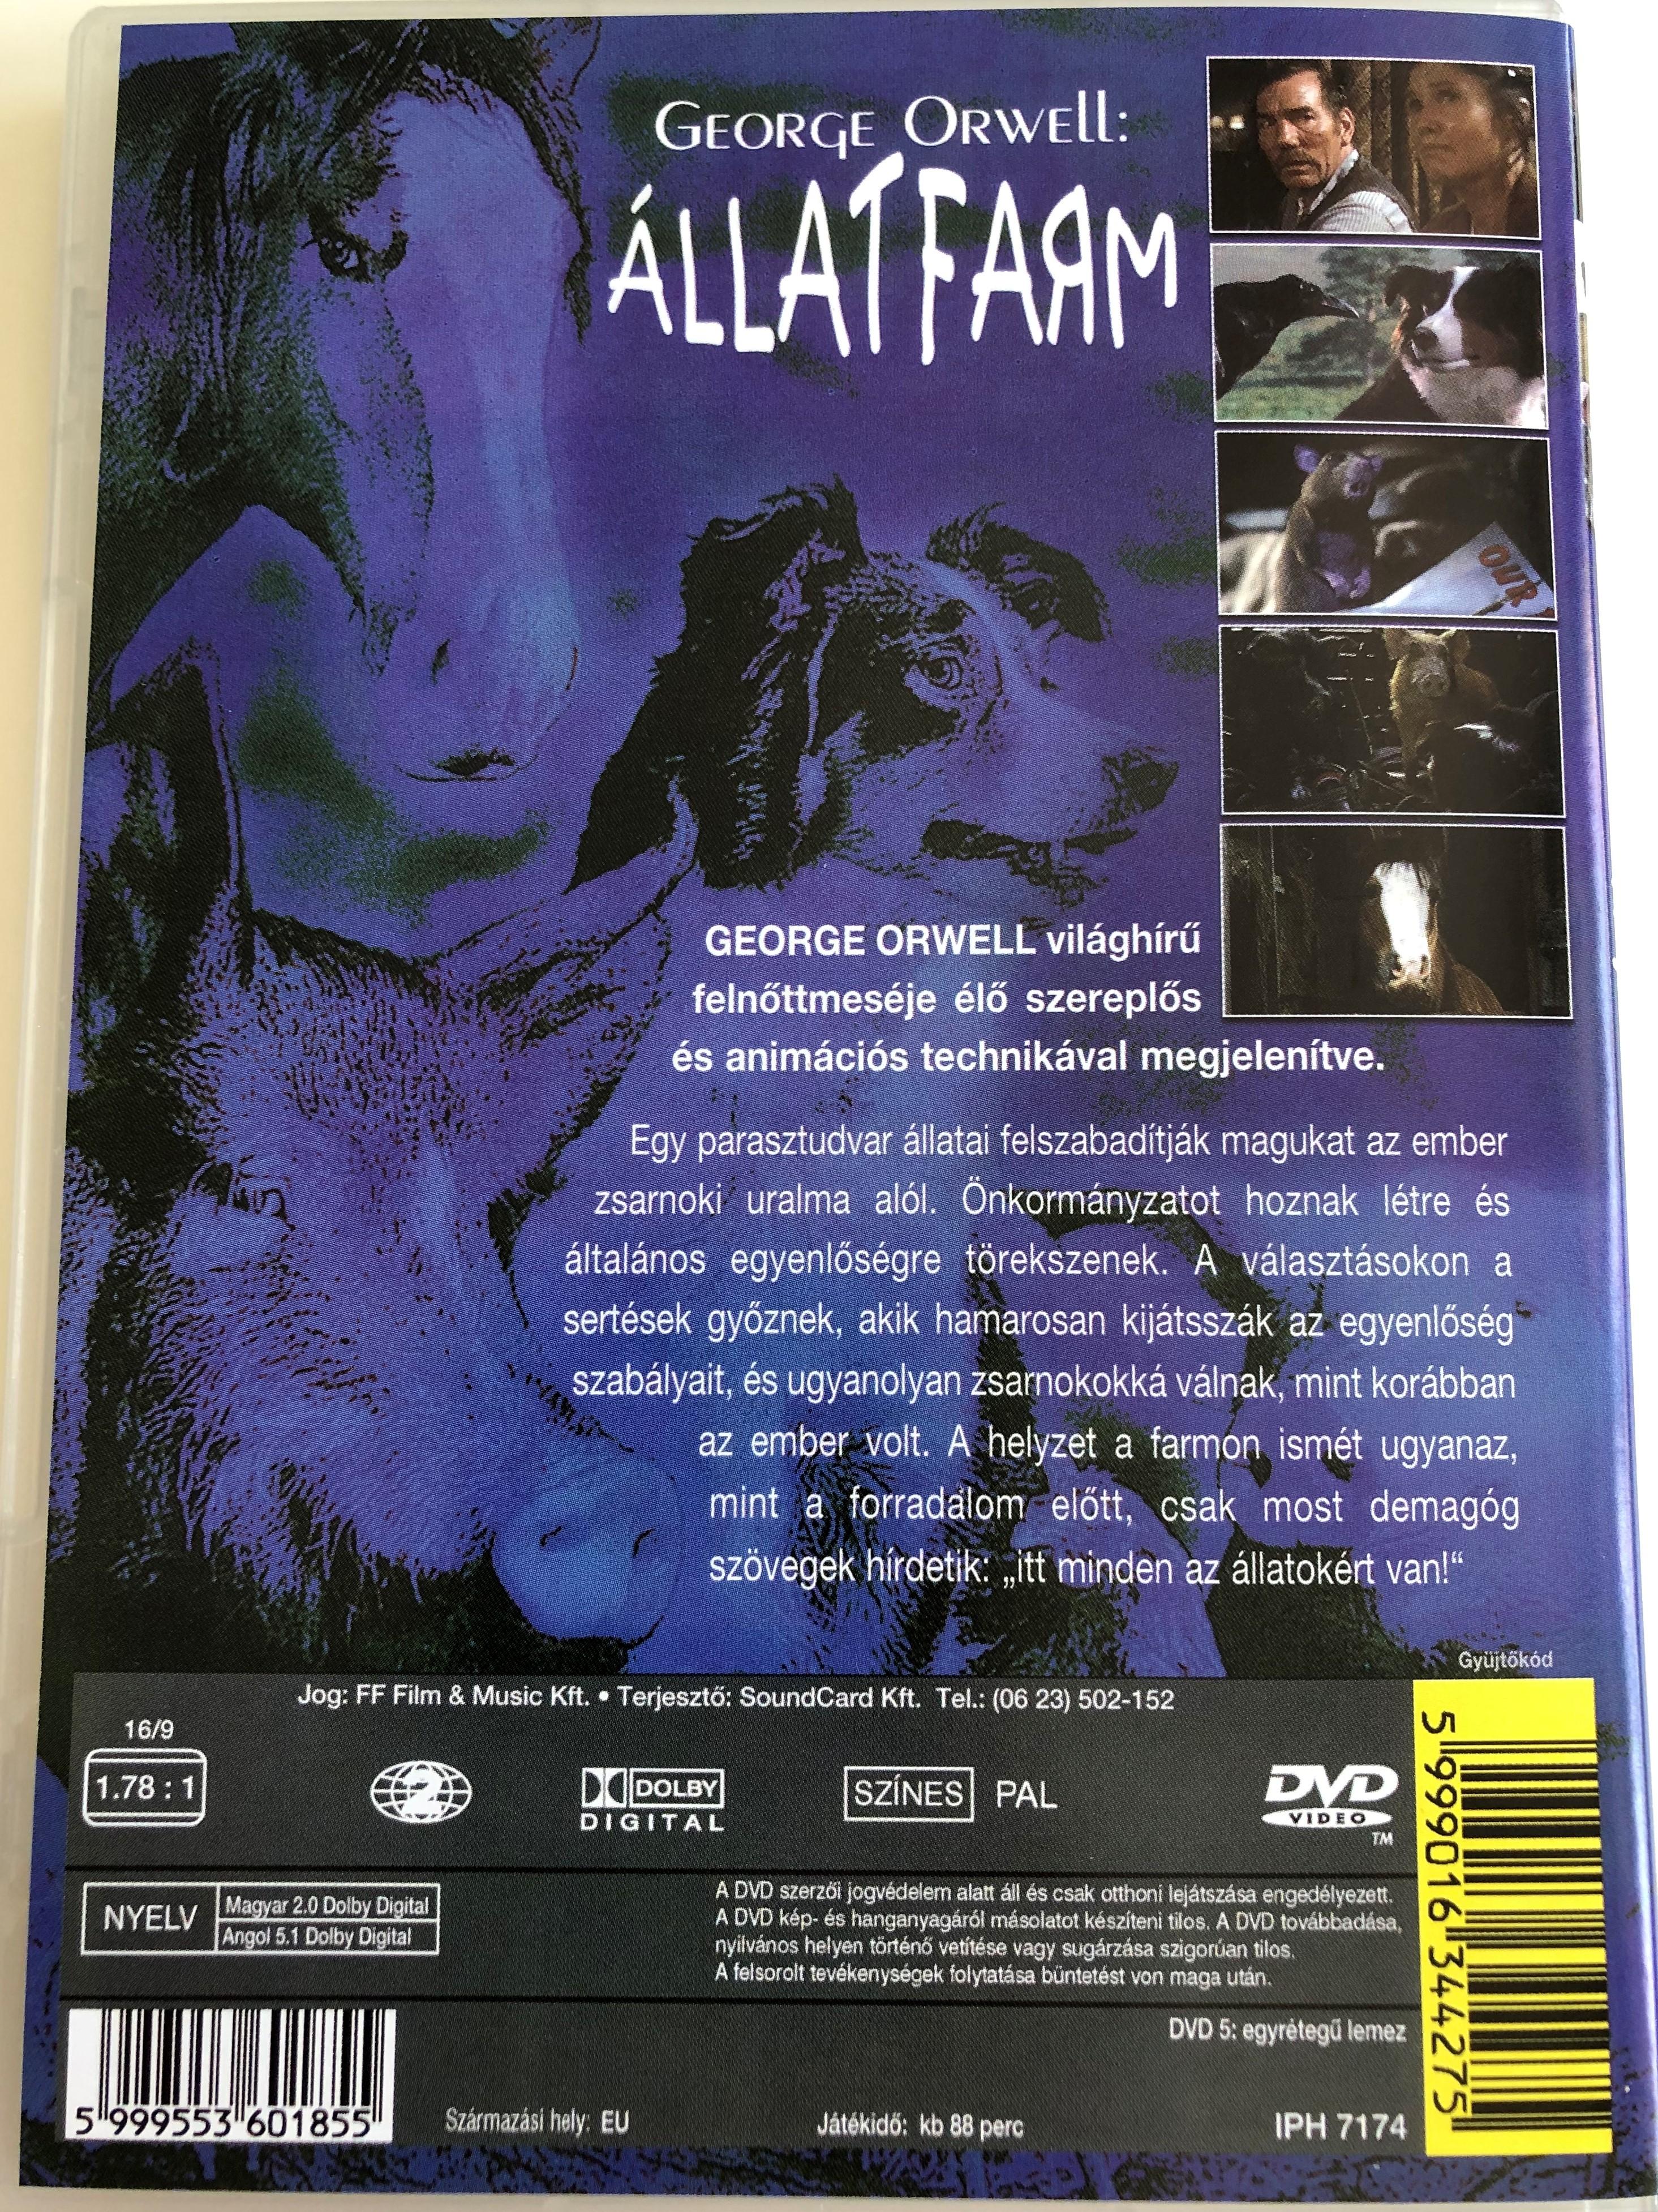 george-orwell-s-animal-farm-dvd-1999-llatfarm-directed-by-john-stephenson-starring-pete-postlethwaite-alan-stanford-caroline-gray-gail-fitzpatrick-2-.jpg